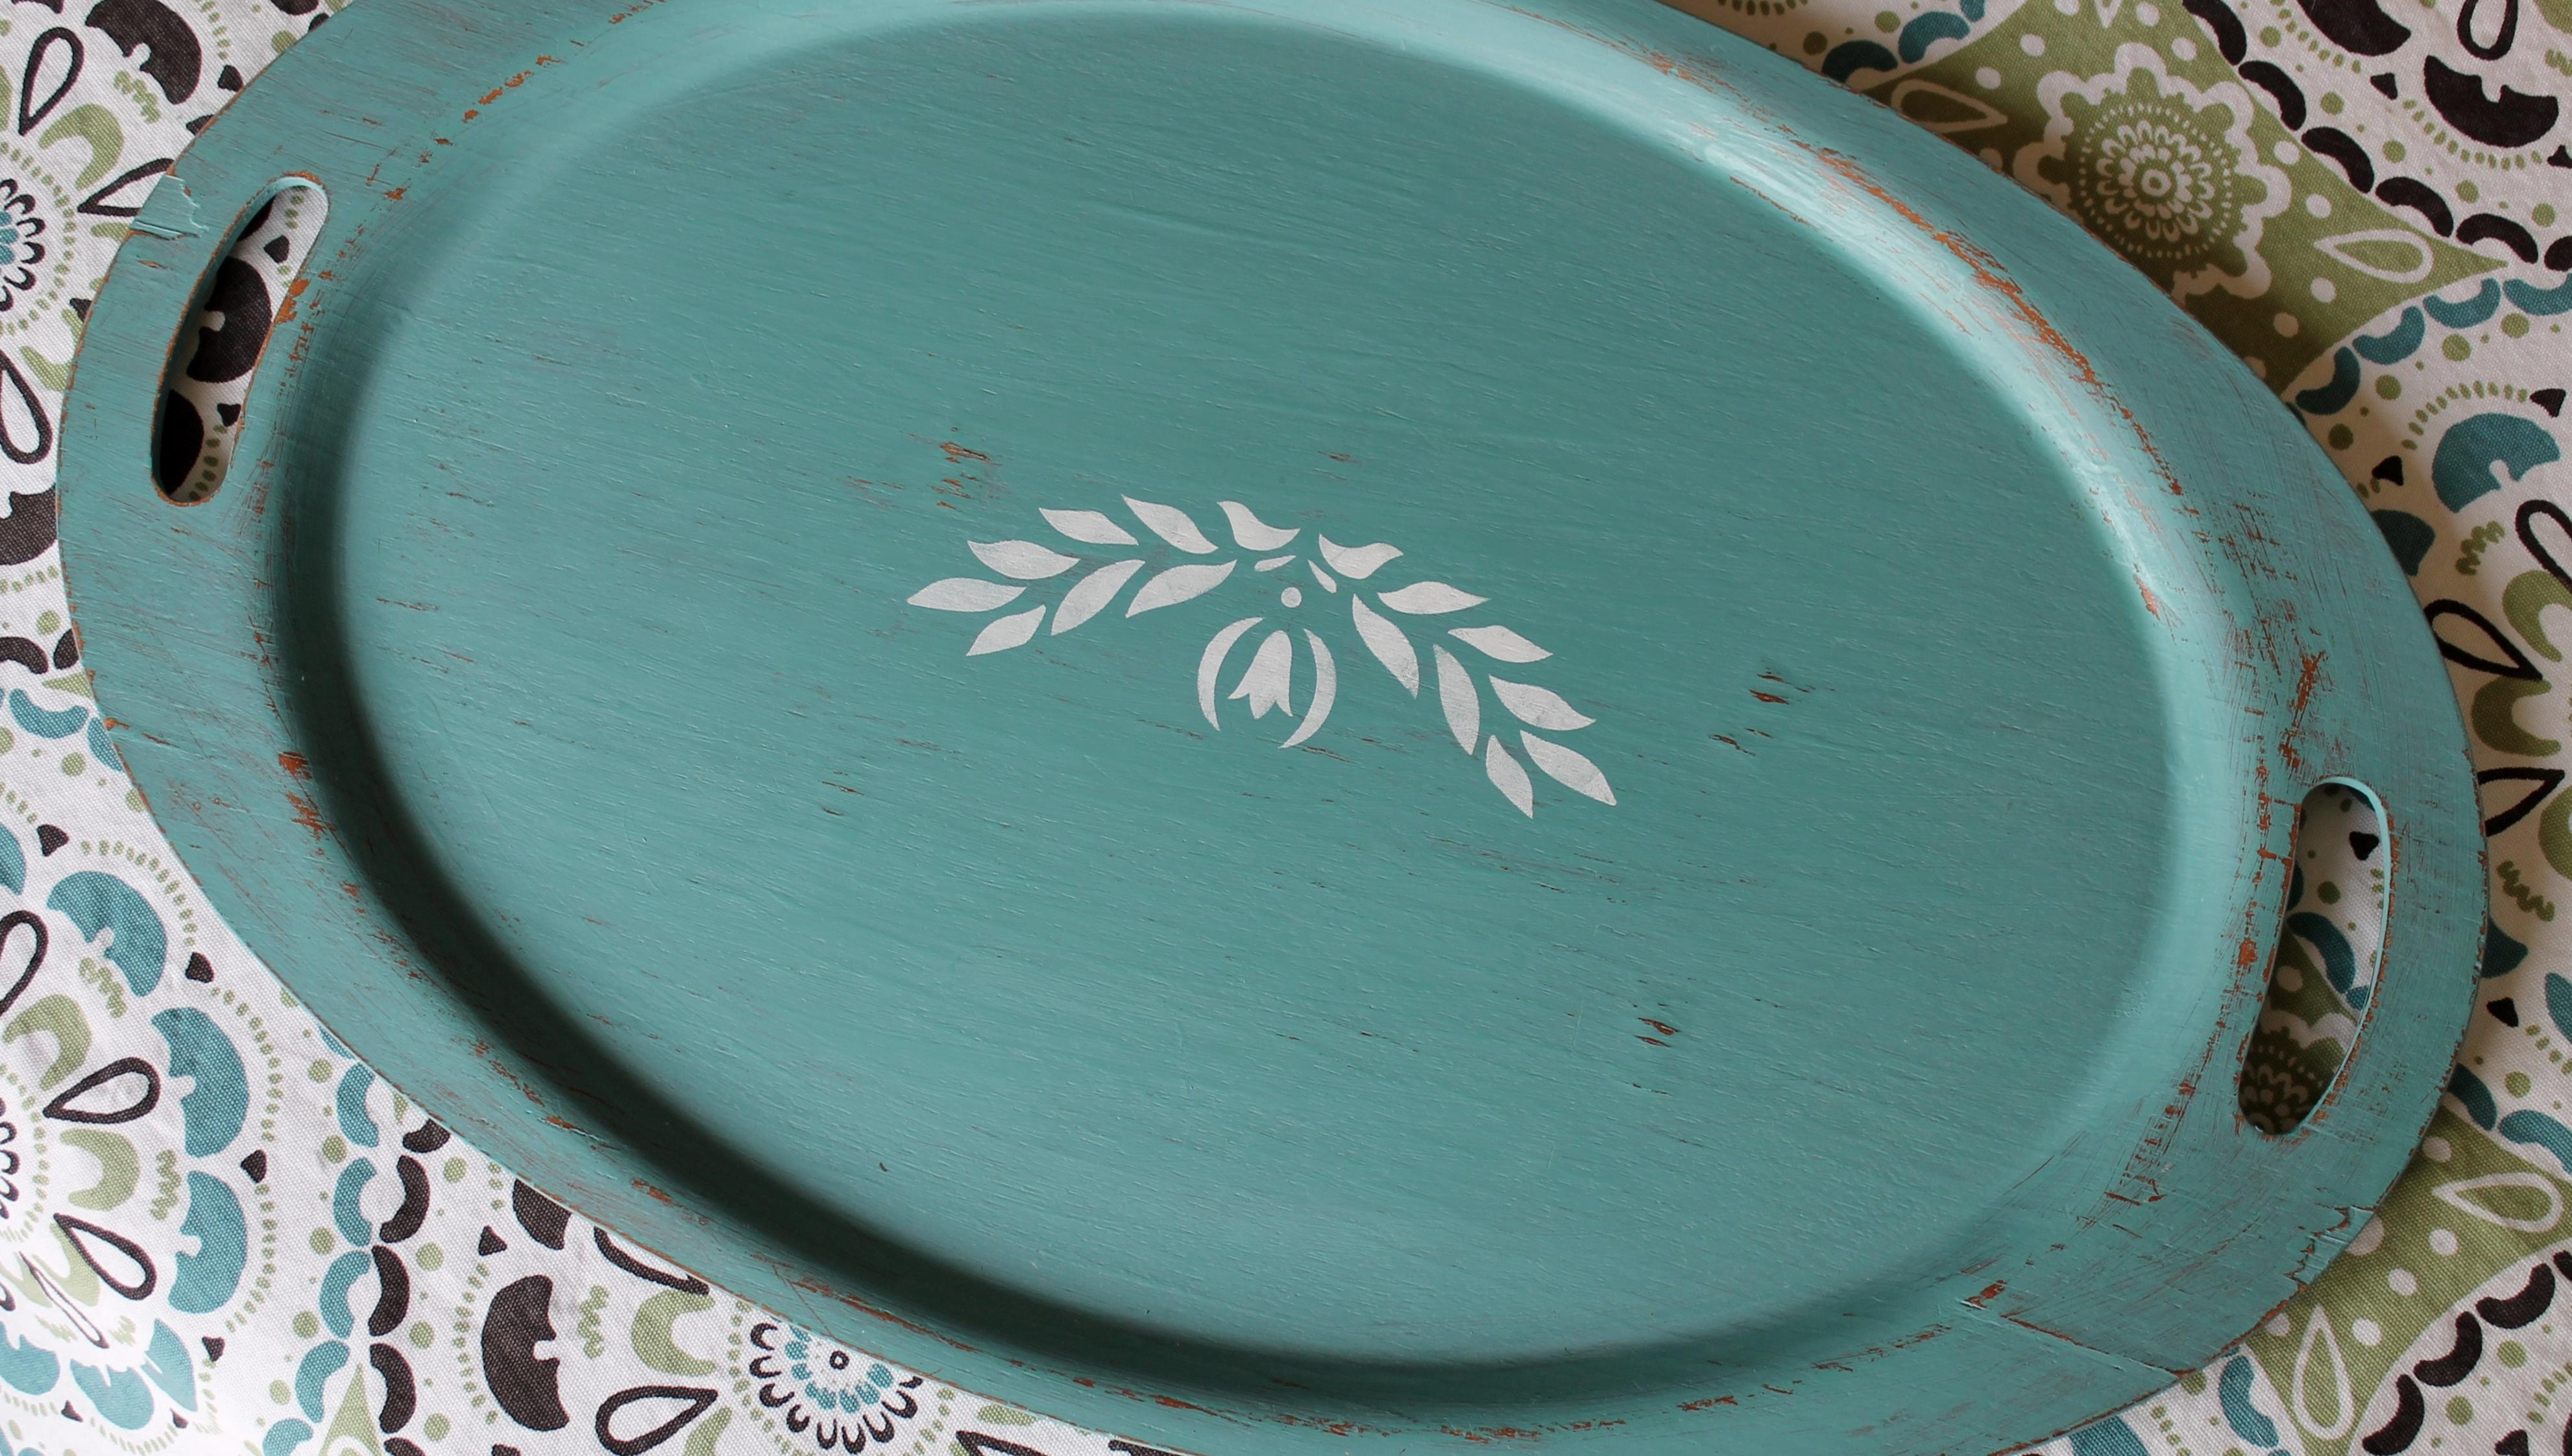 Robin's Egg Blue Vintage Tray